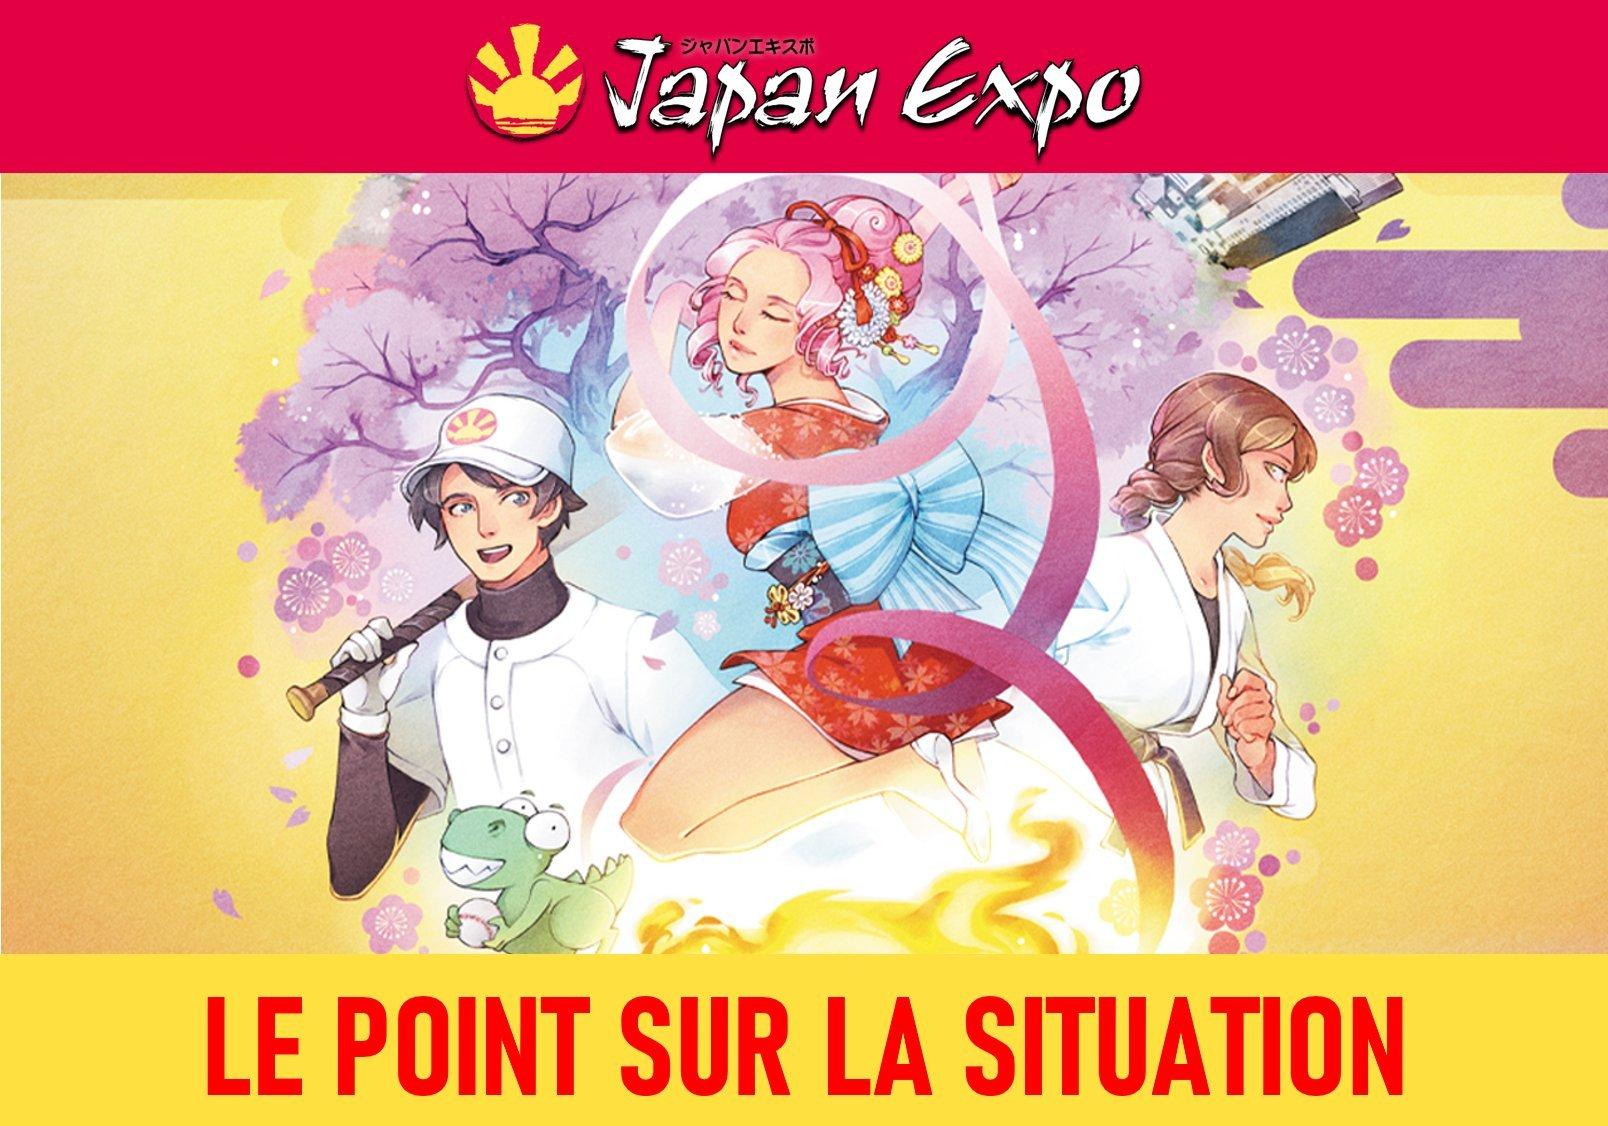 japanexpo 延期 法国 巴黎